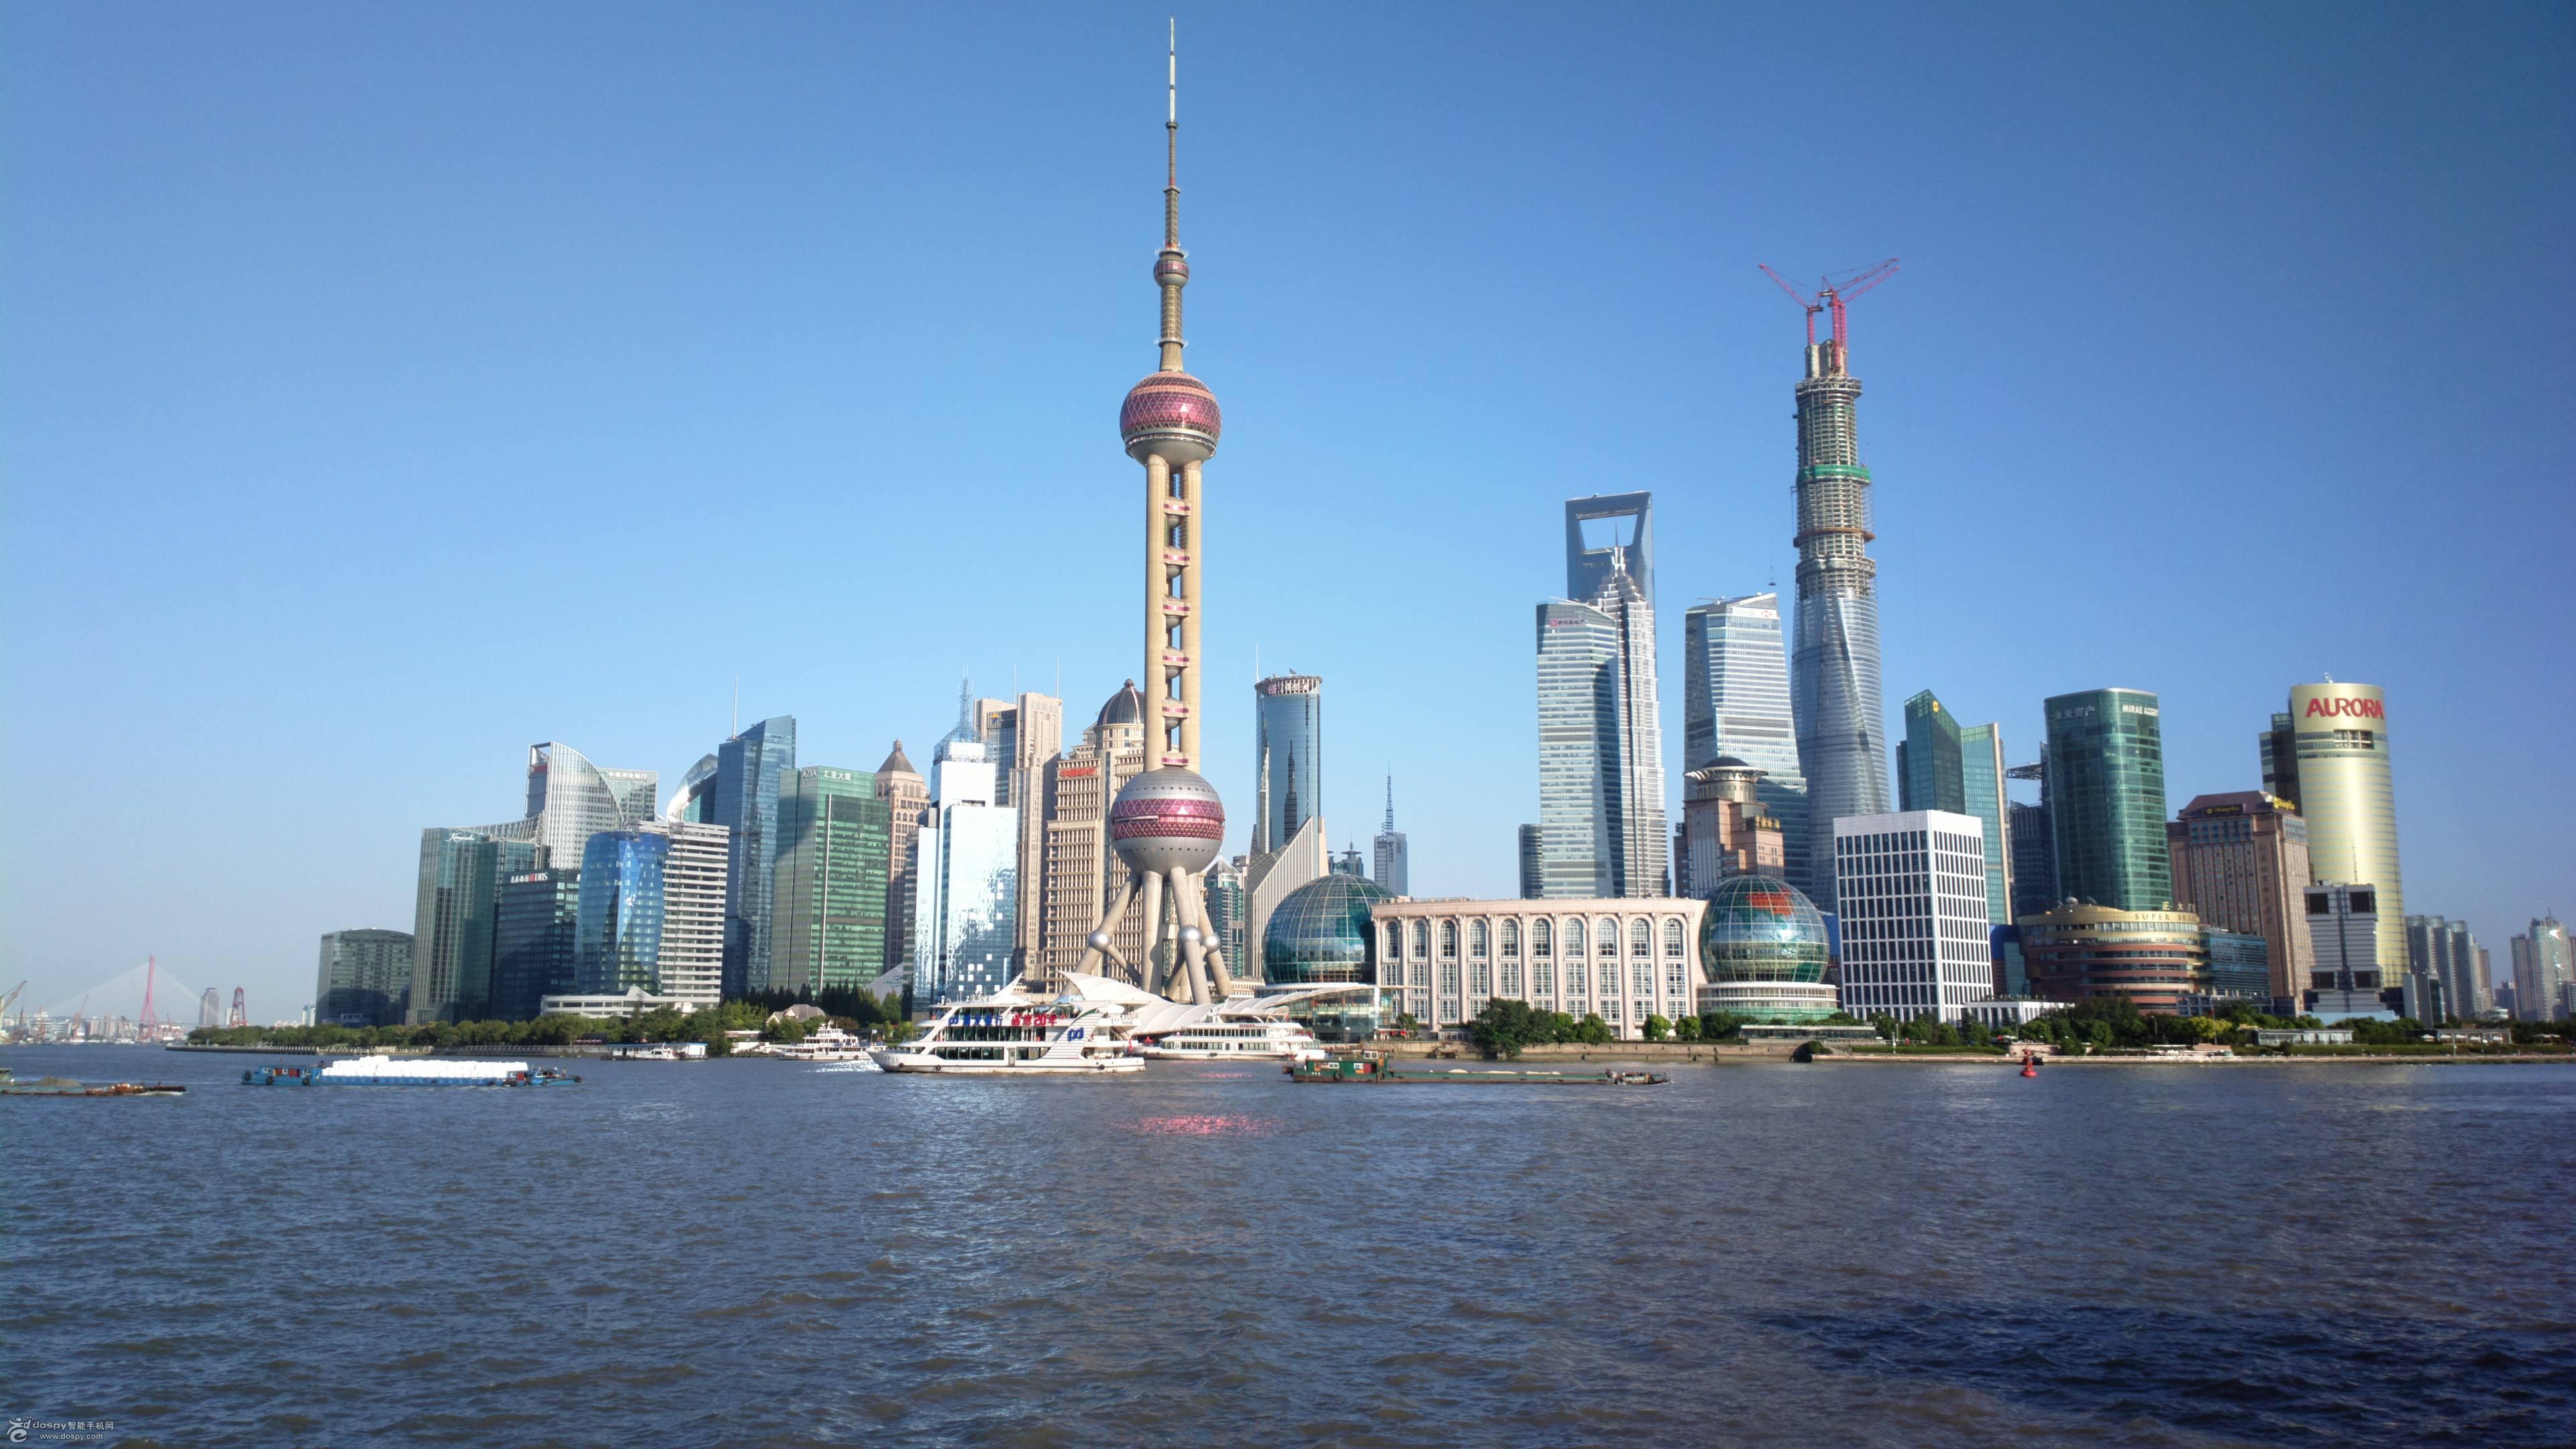 <b>长江沿岸新一线城市角逐,武汉、南京、重庆,谁将最先跨入新一线</b>